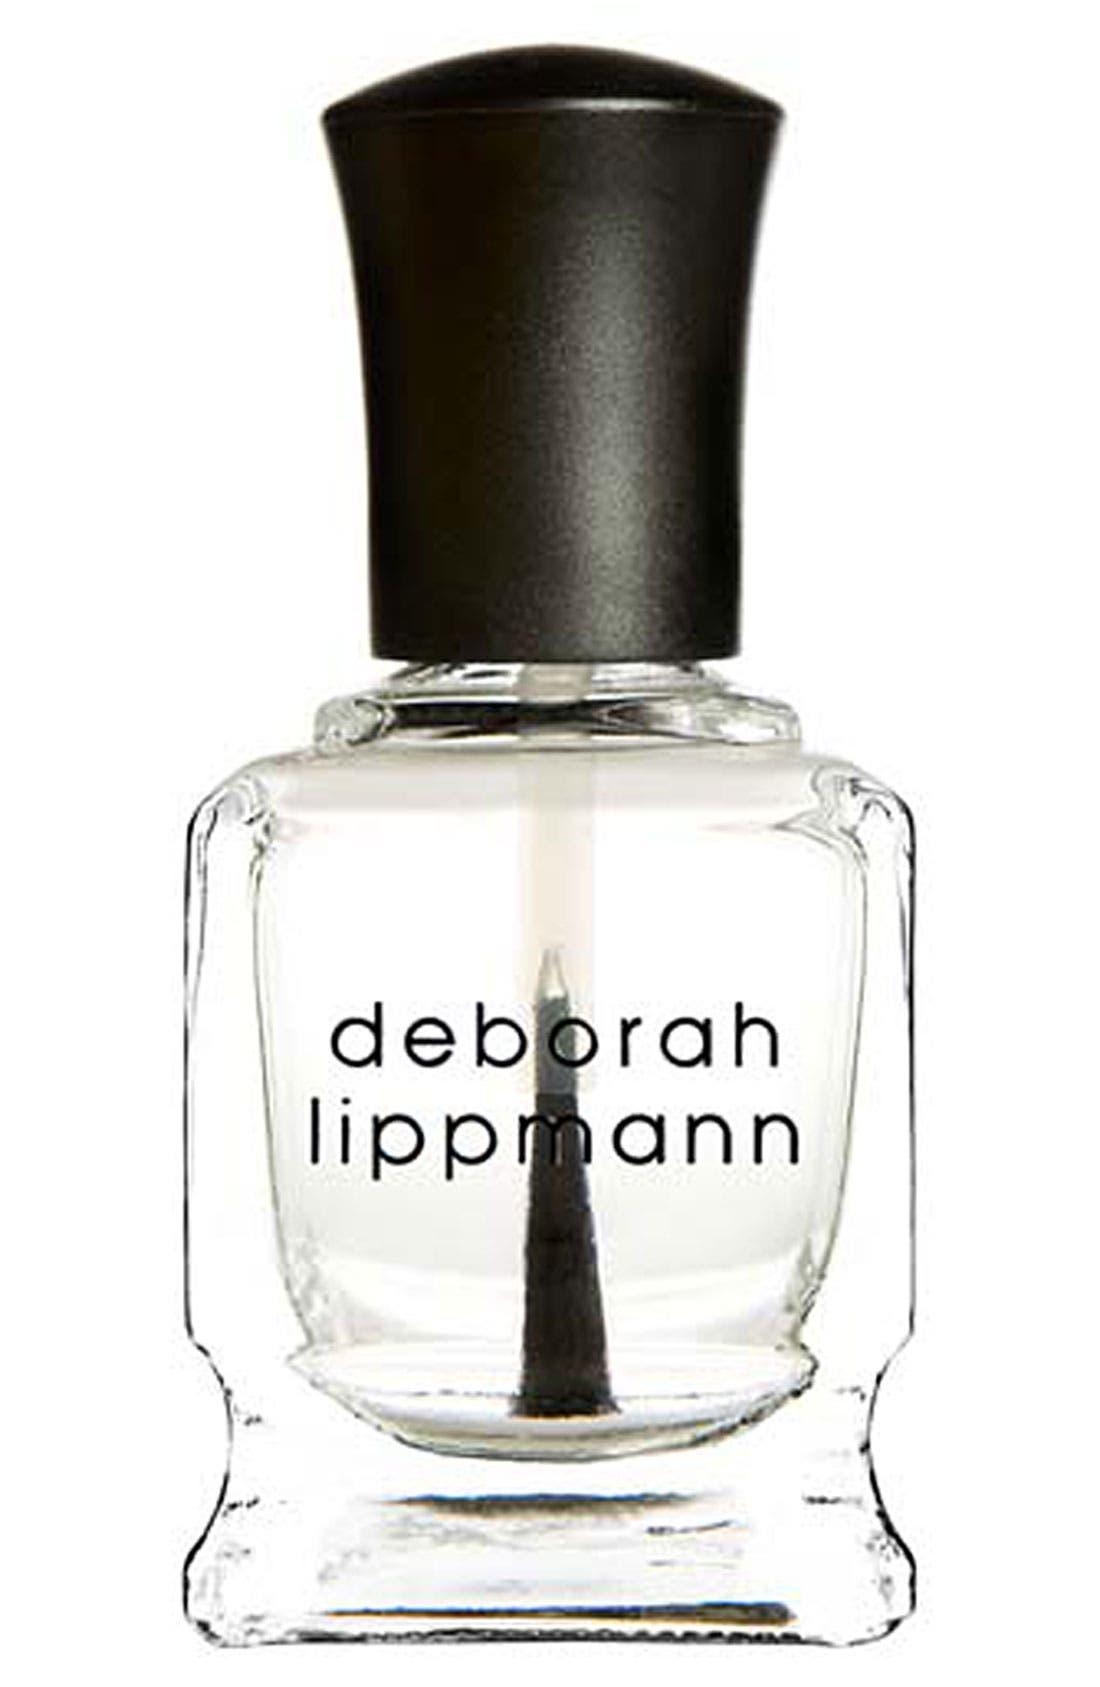 Deborah Lippmann 'Hard Rock' Hydrating Nail Hardener